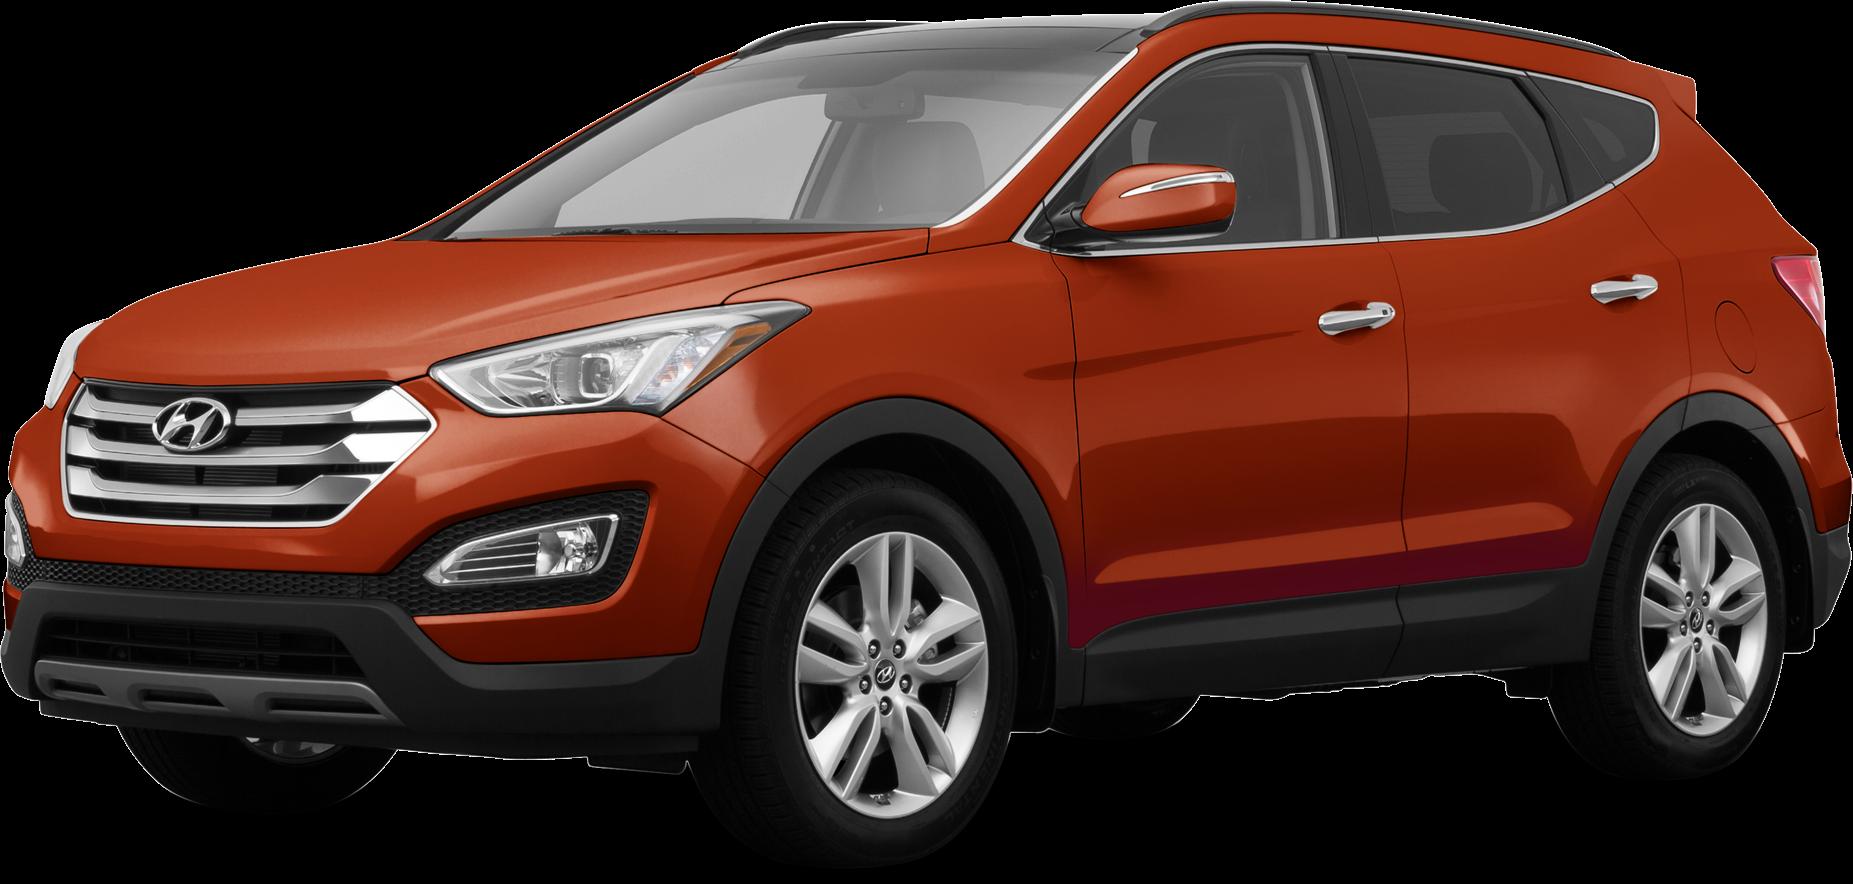 2015 Hyundai Santa Fe Sport Values Cars For Sale Kelley Blue Book